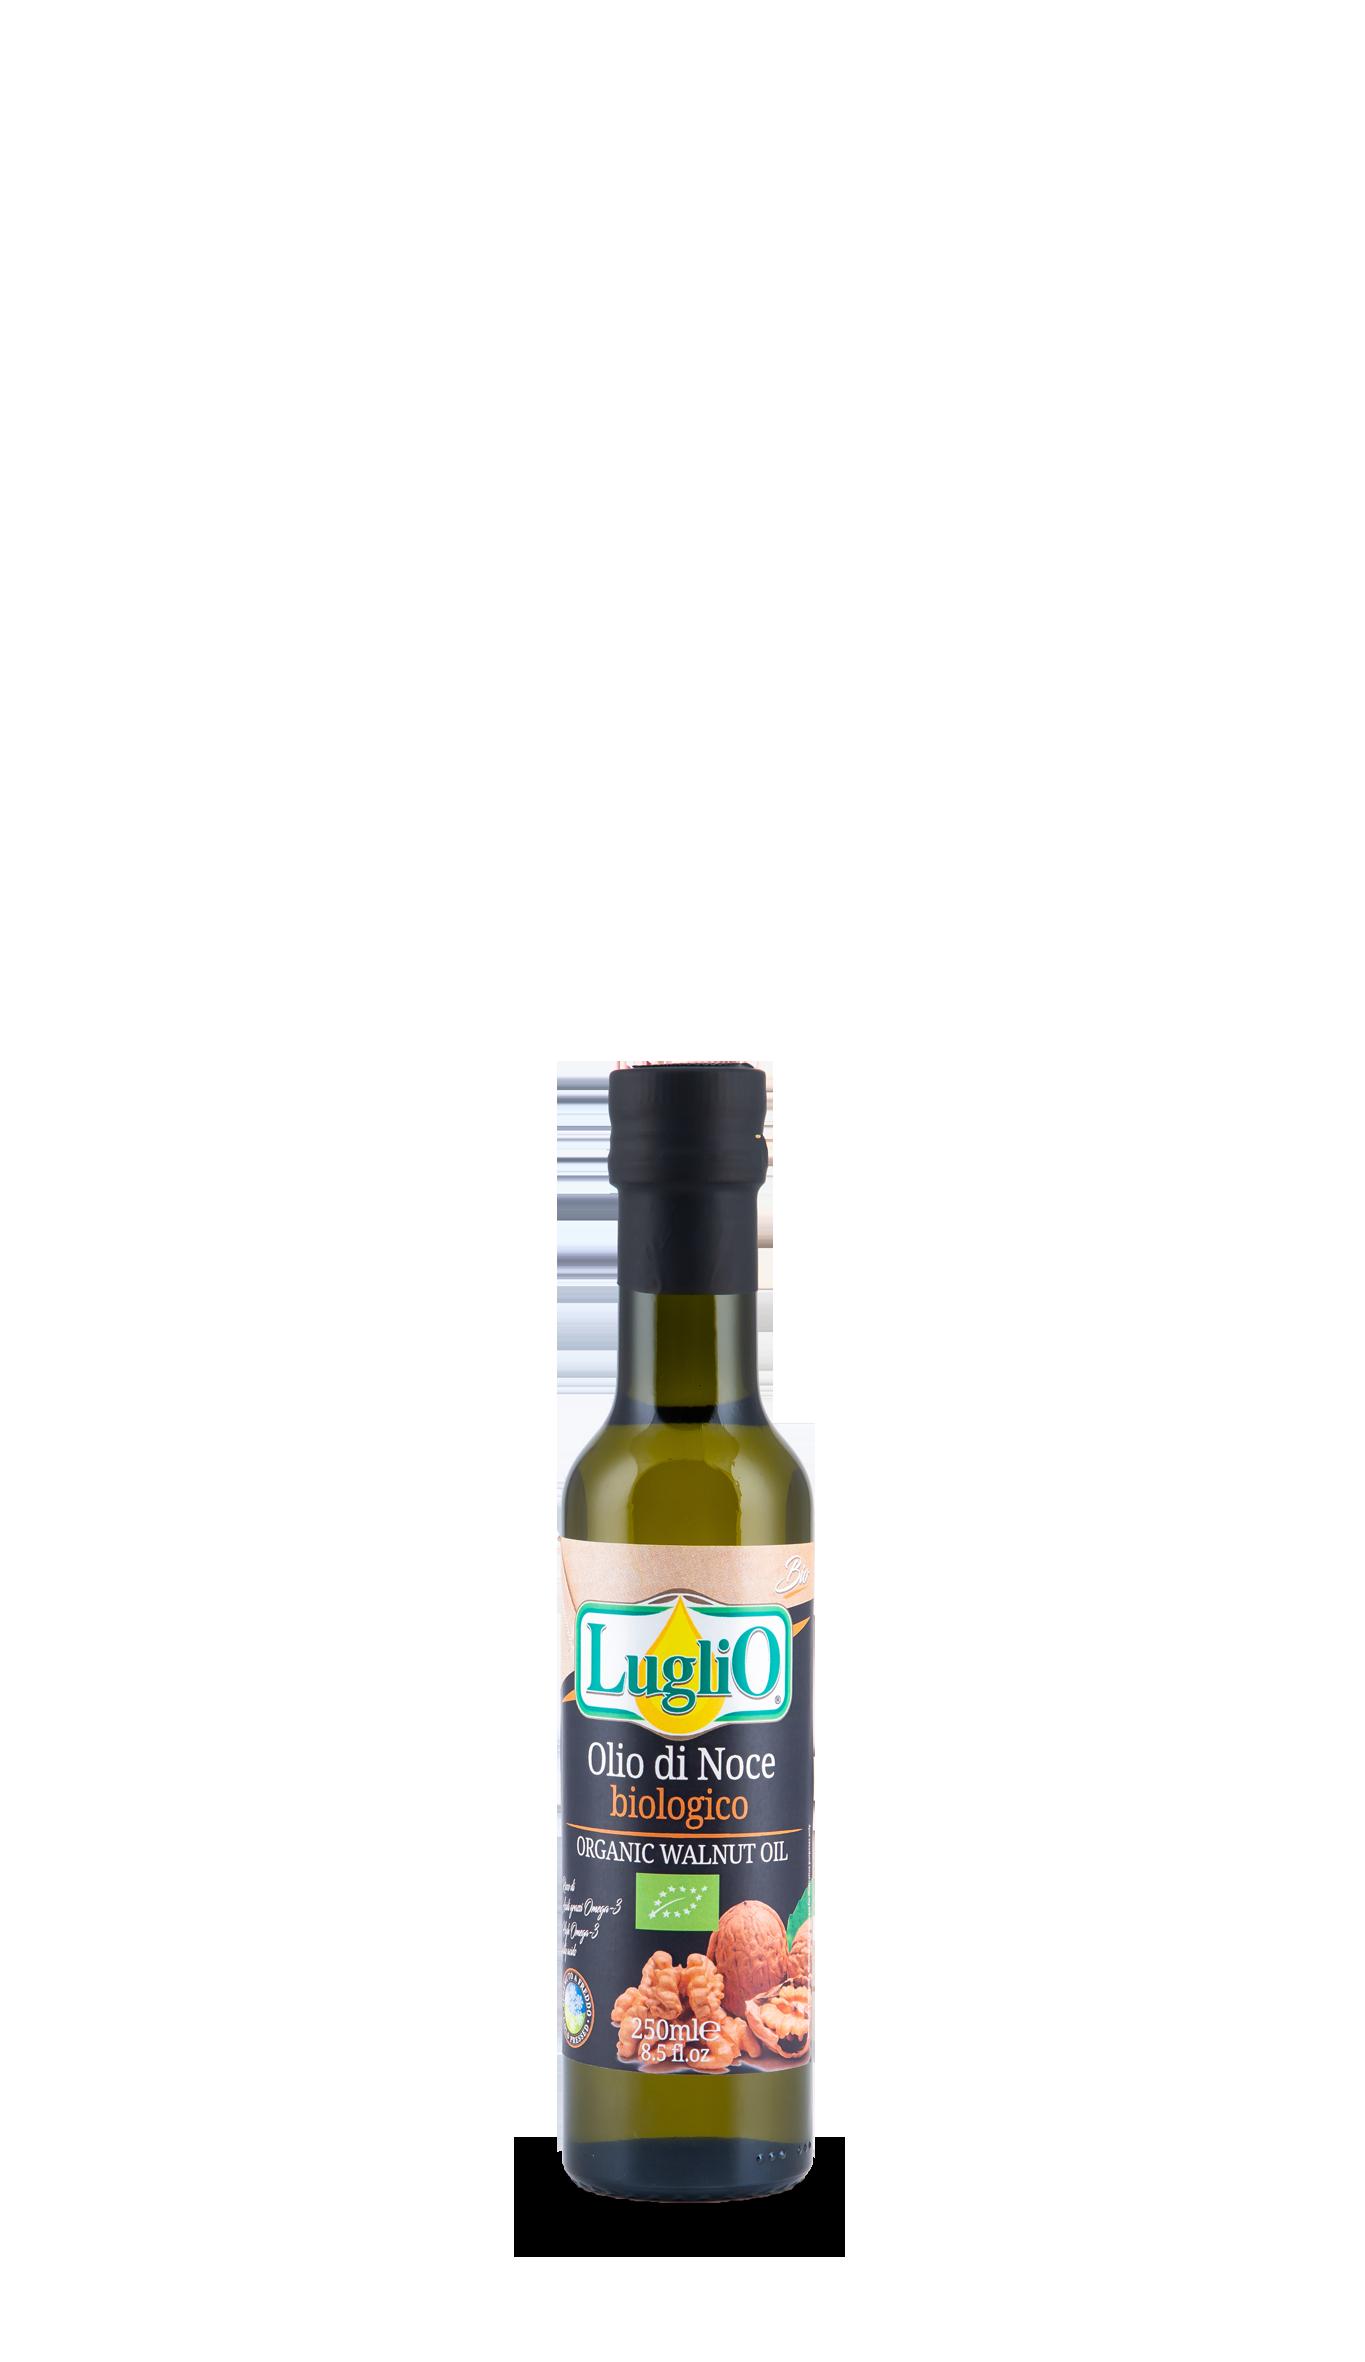 olio di noce 250 ml olio luglio